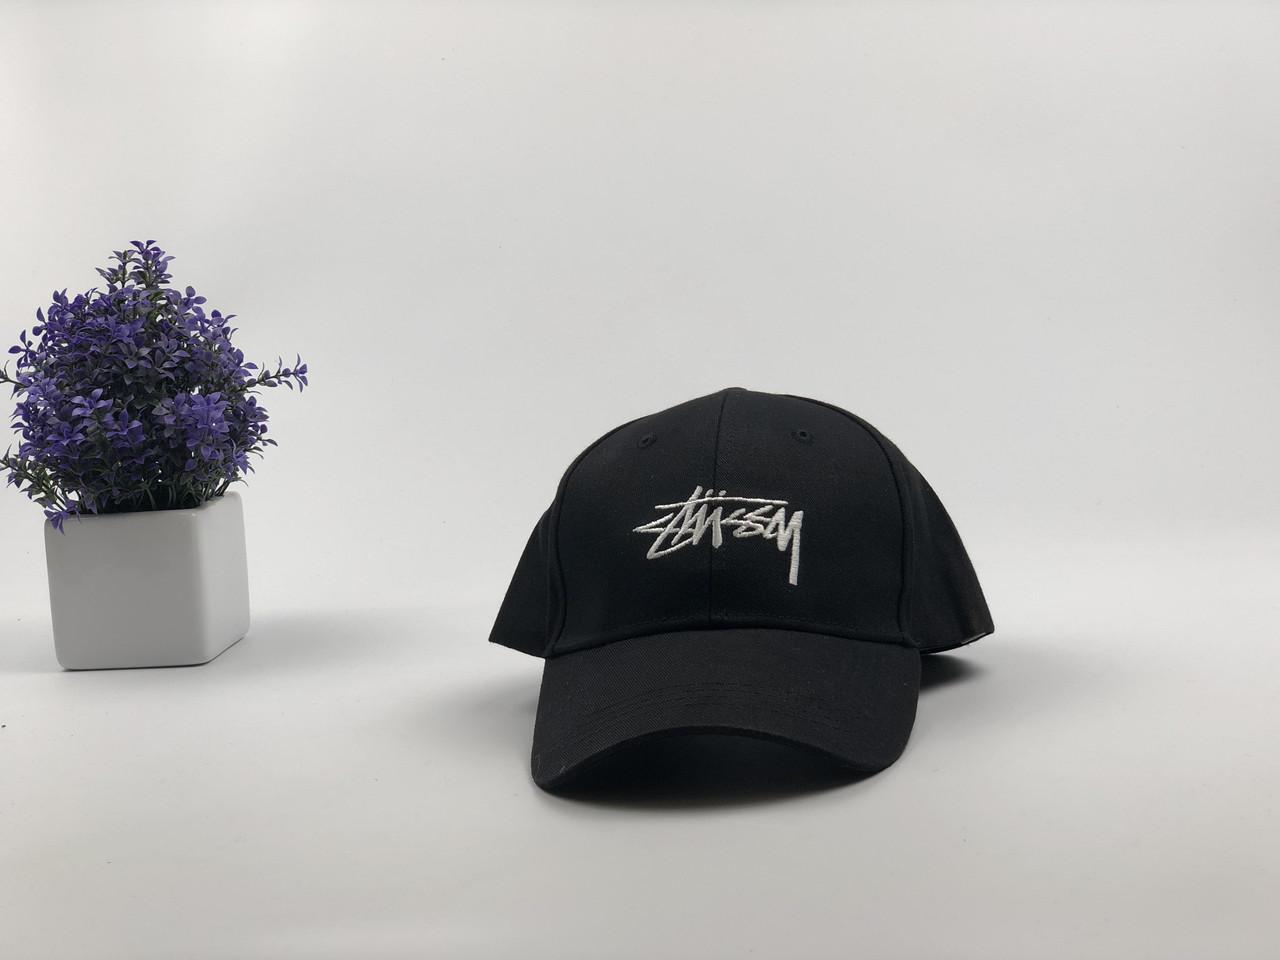 Кепка бейсболка Stussy (черная)